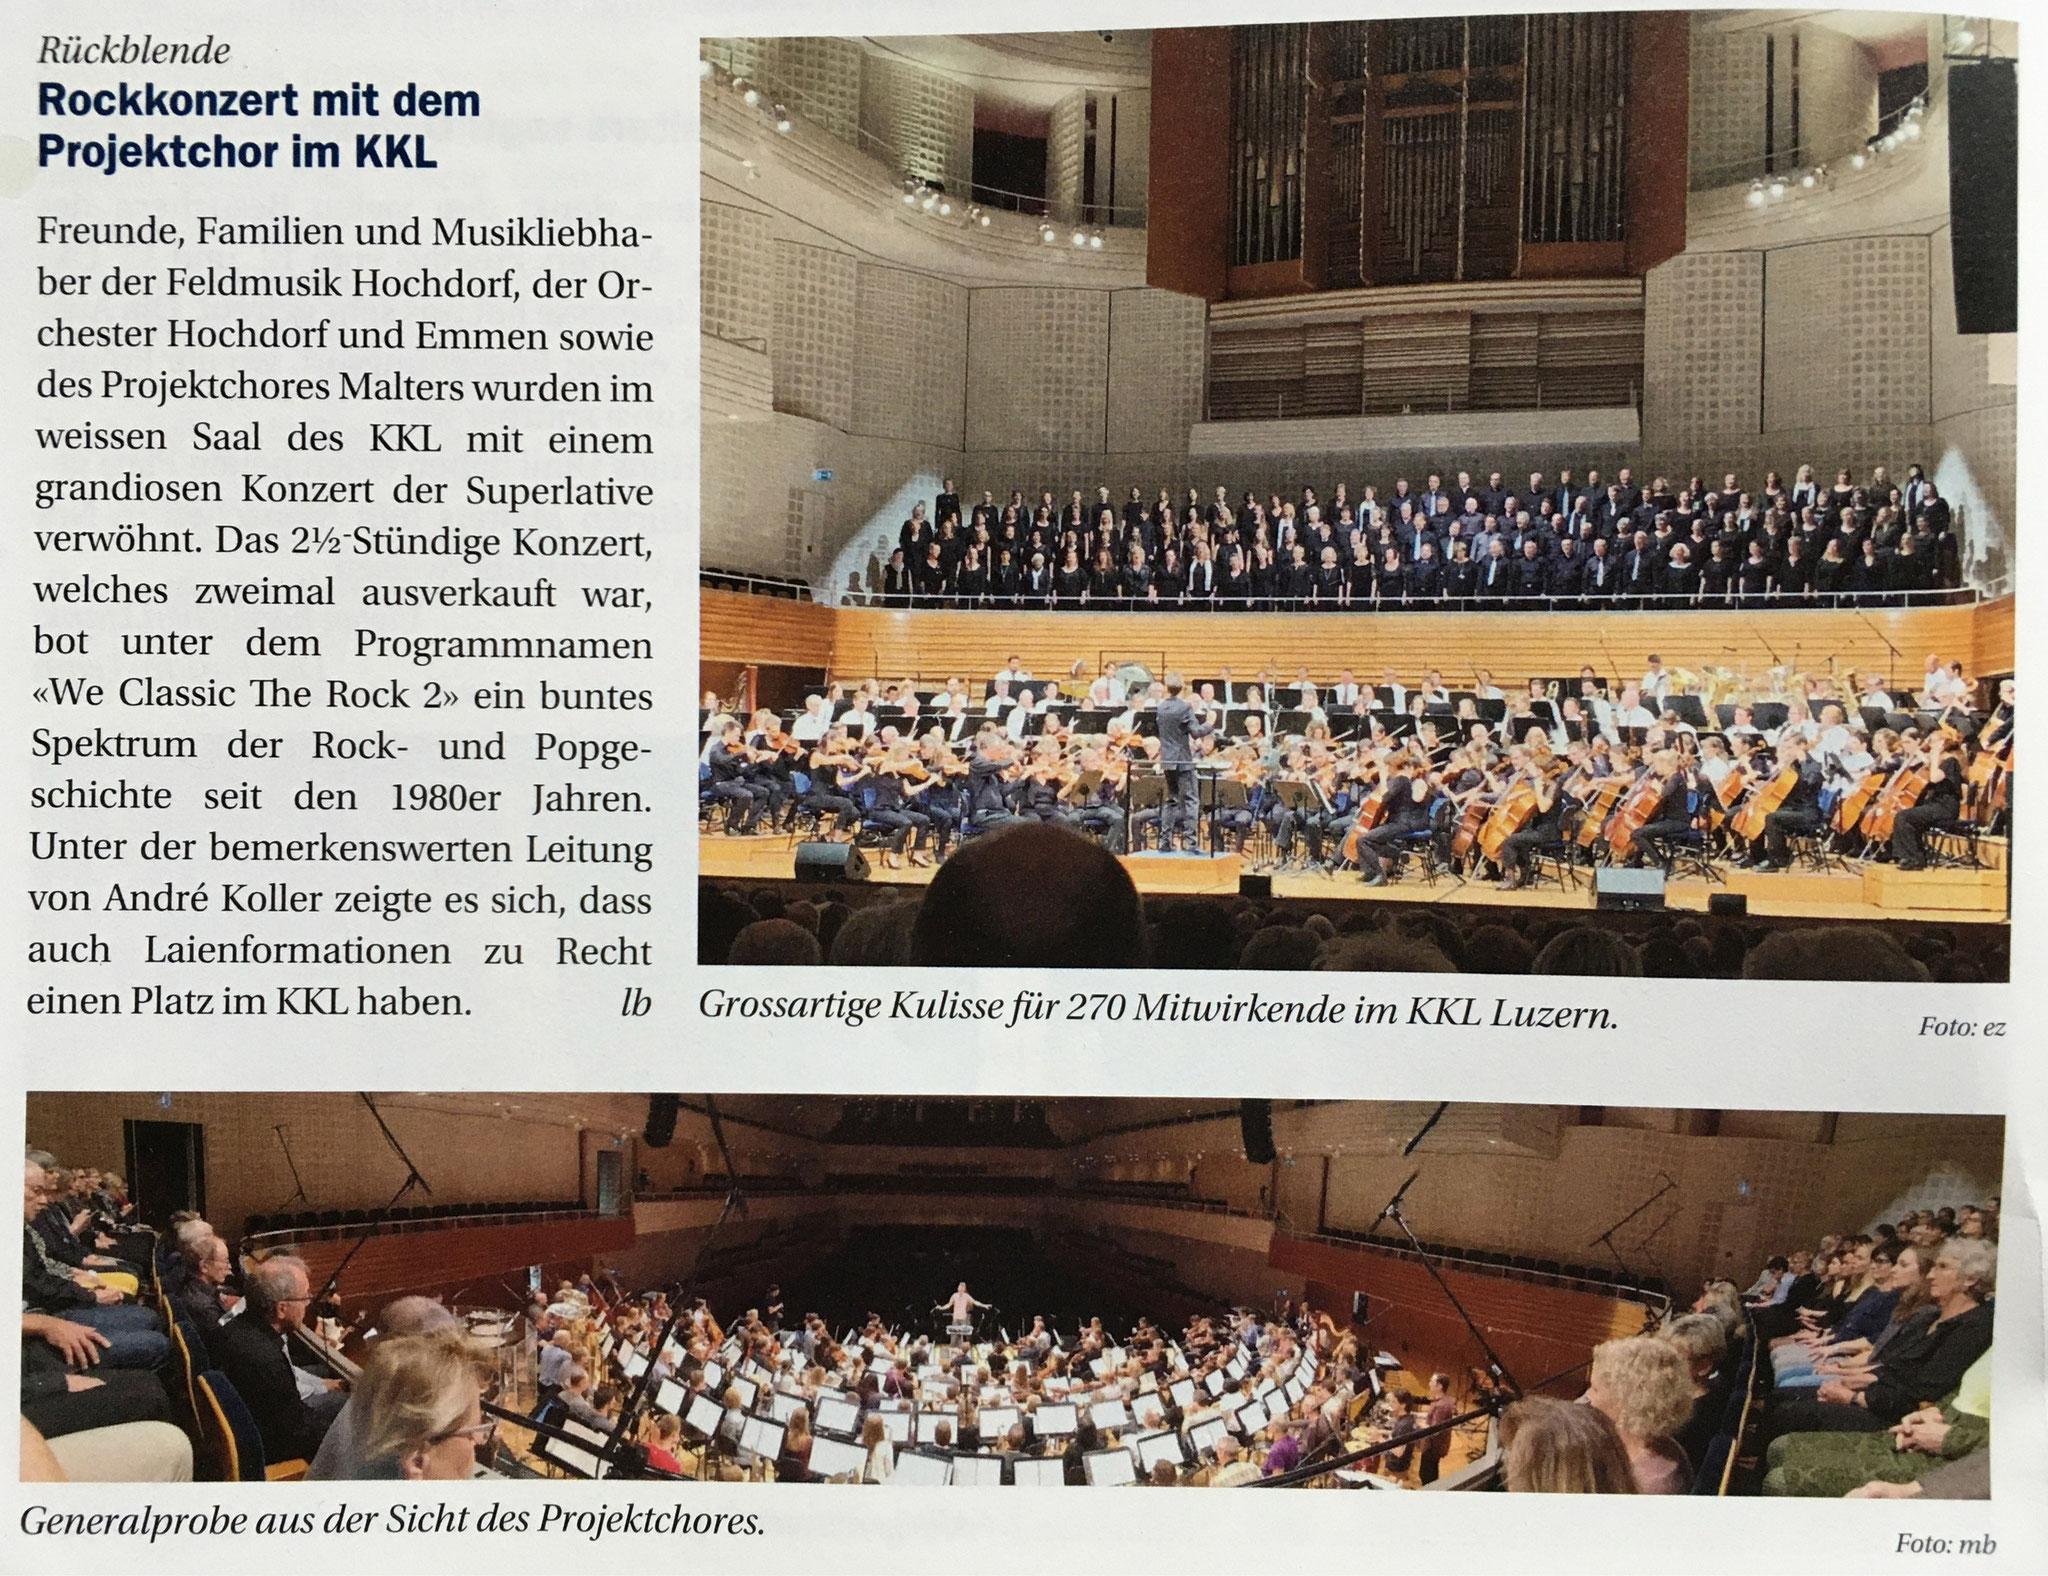 Pfarreiblatt 20/2019 Pastoralraum Malters-Schwarzenberg